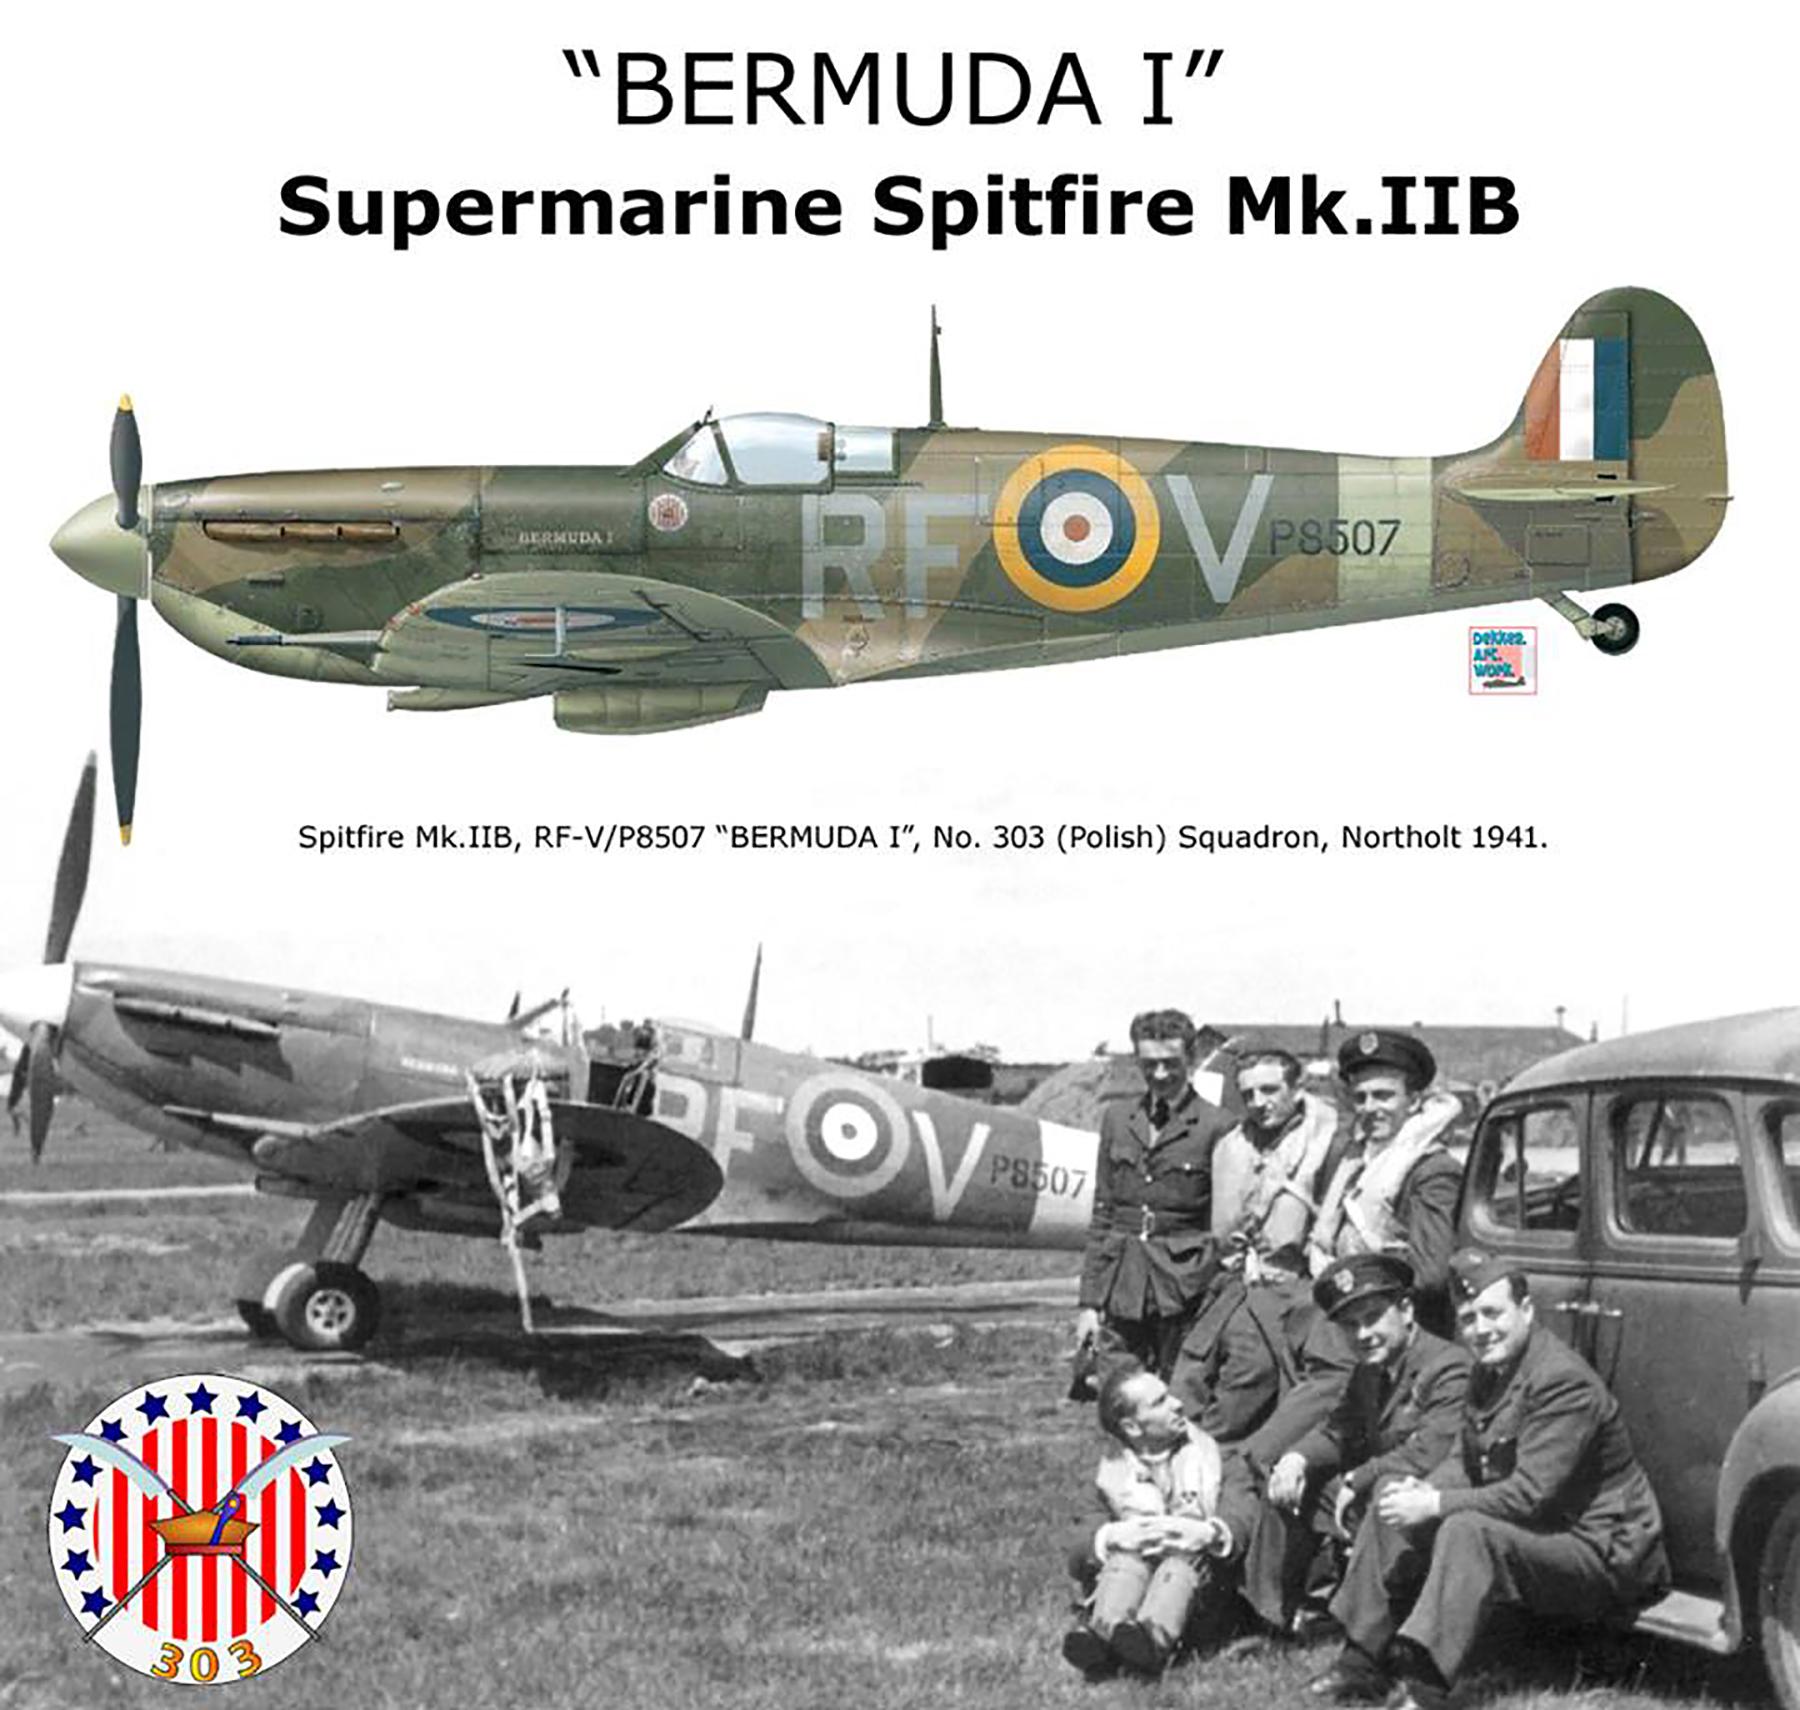 Spitfire MkIIb RAF 303(Polish) RFV Bermuda I P8507 Northolt 1941 01